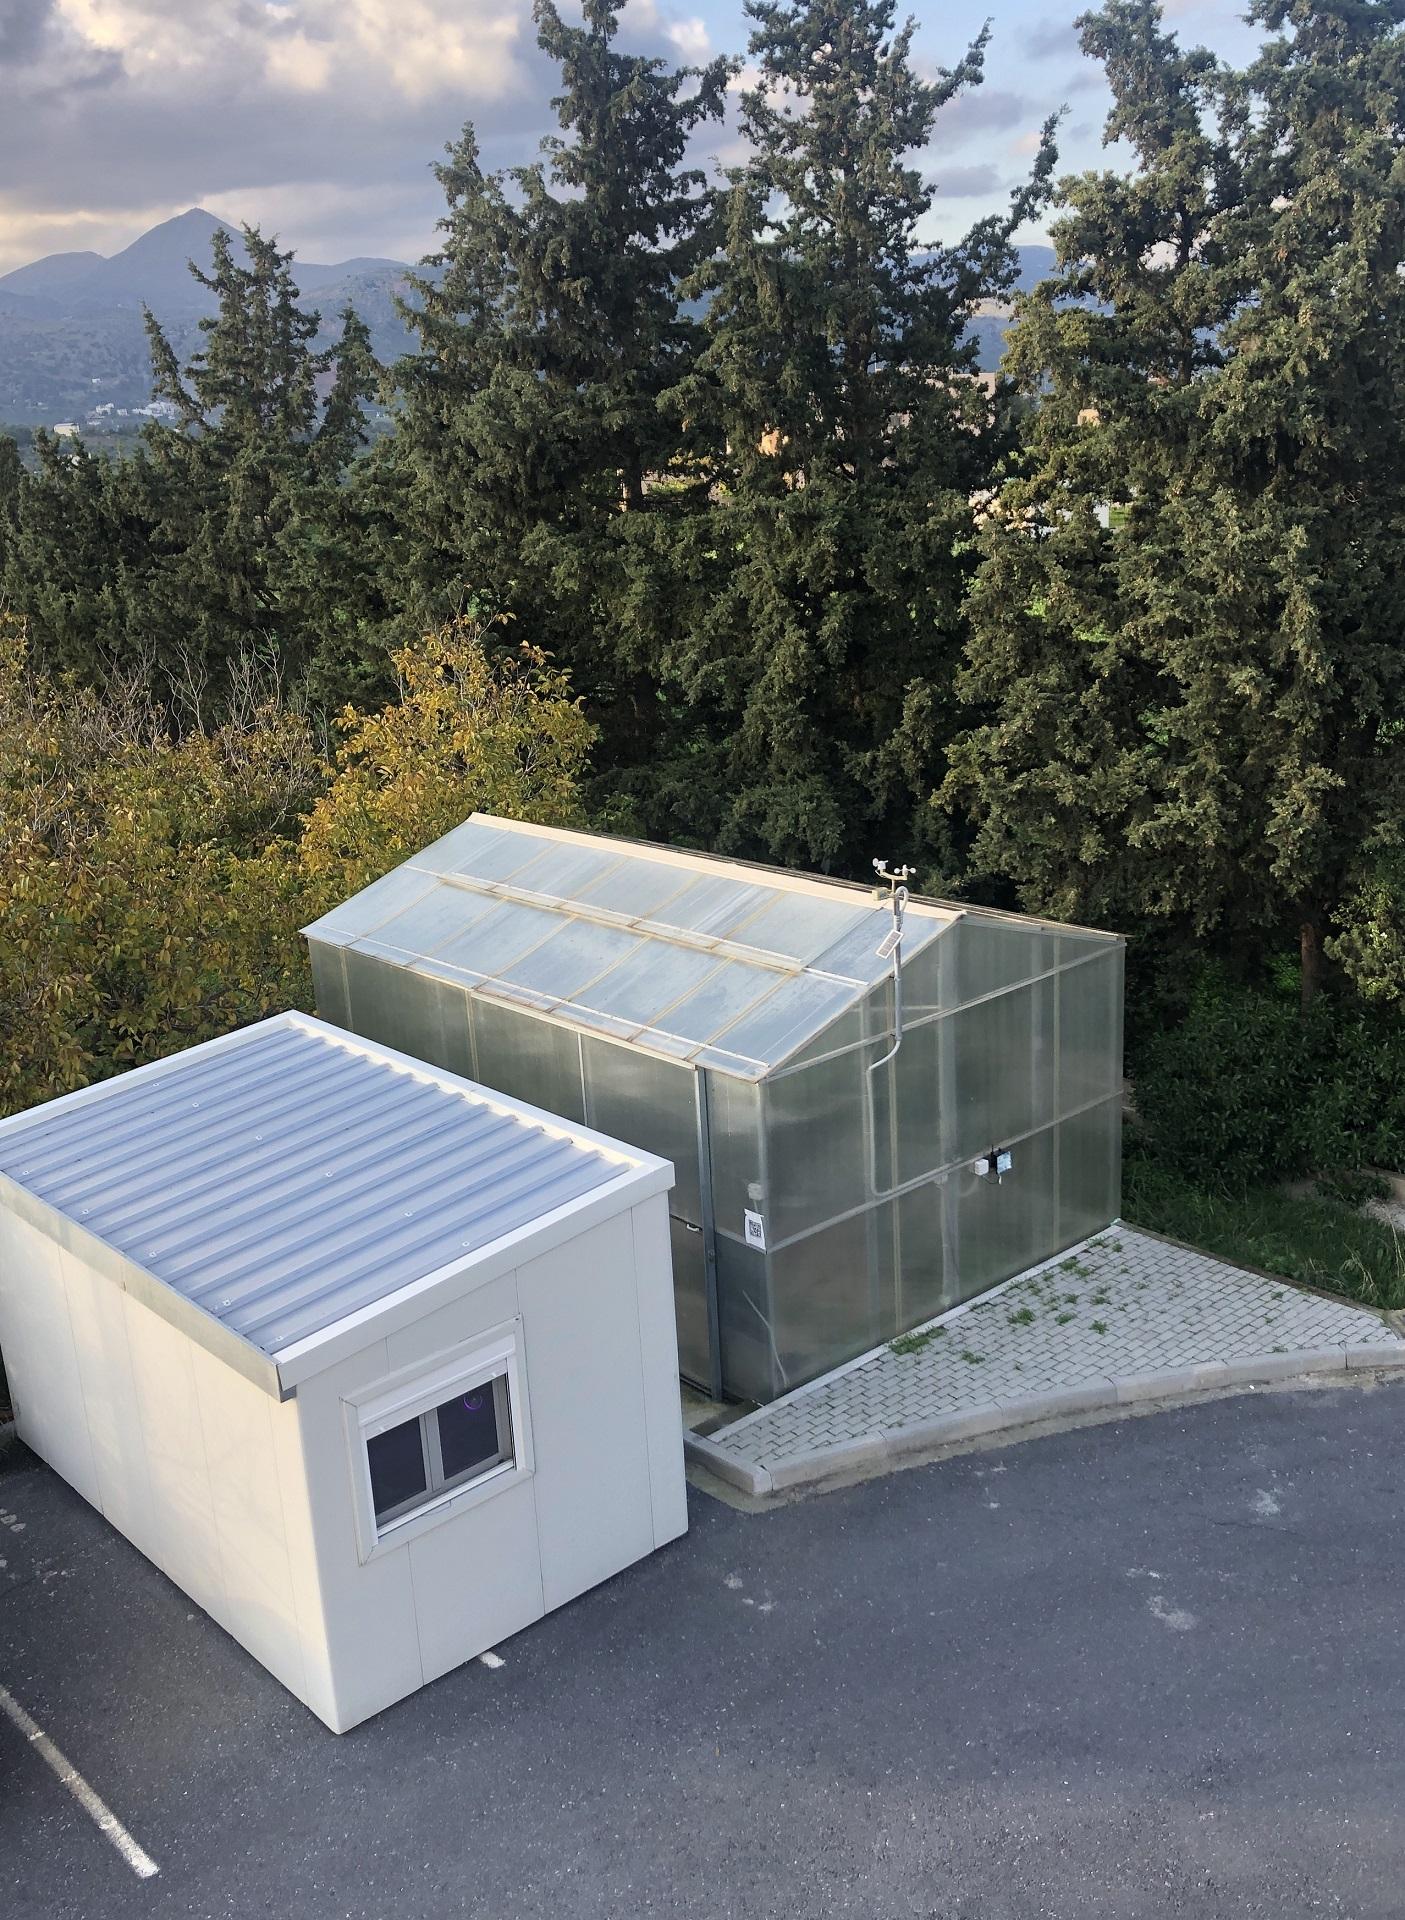 The Intelligent Greenhouse